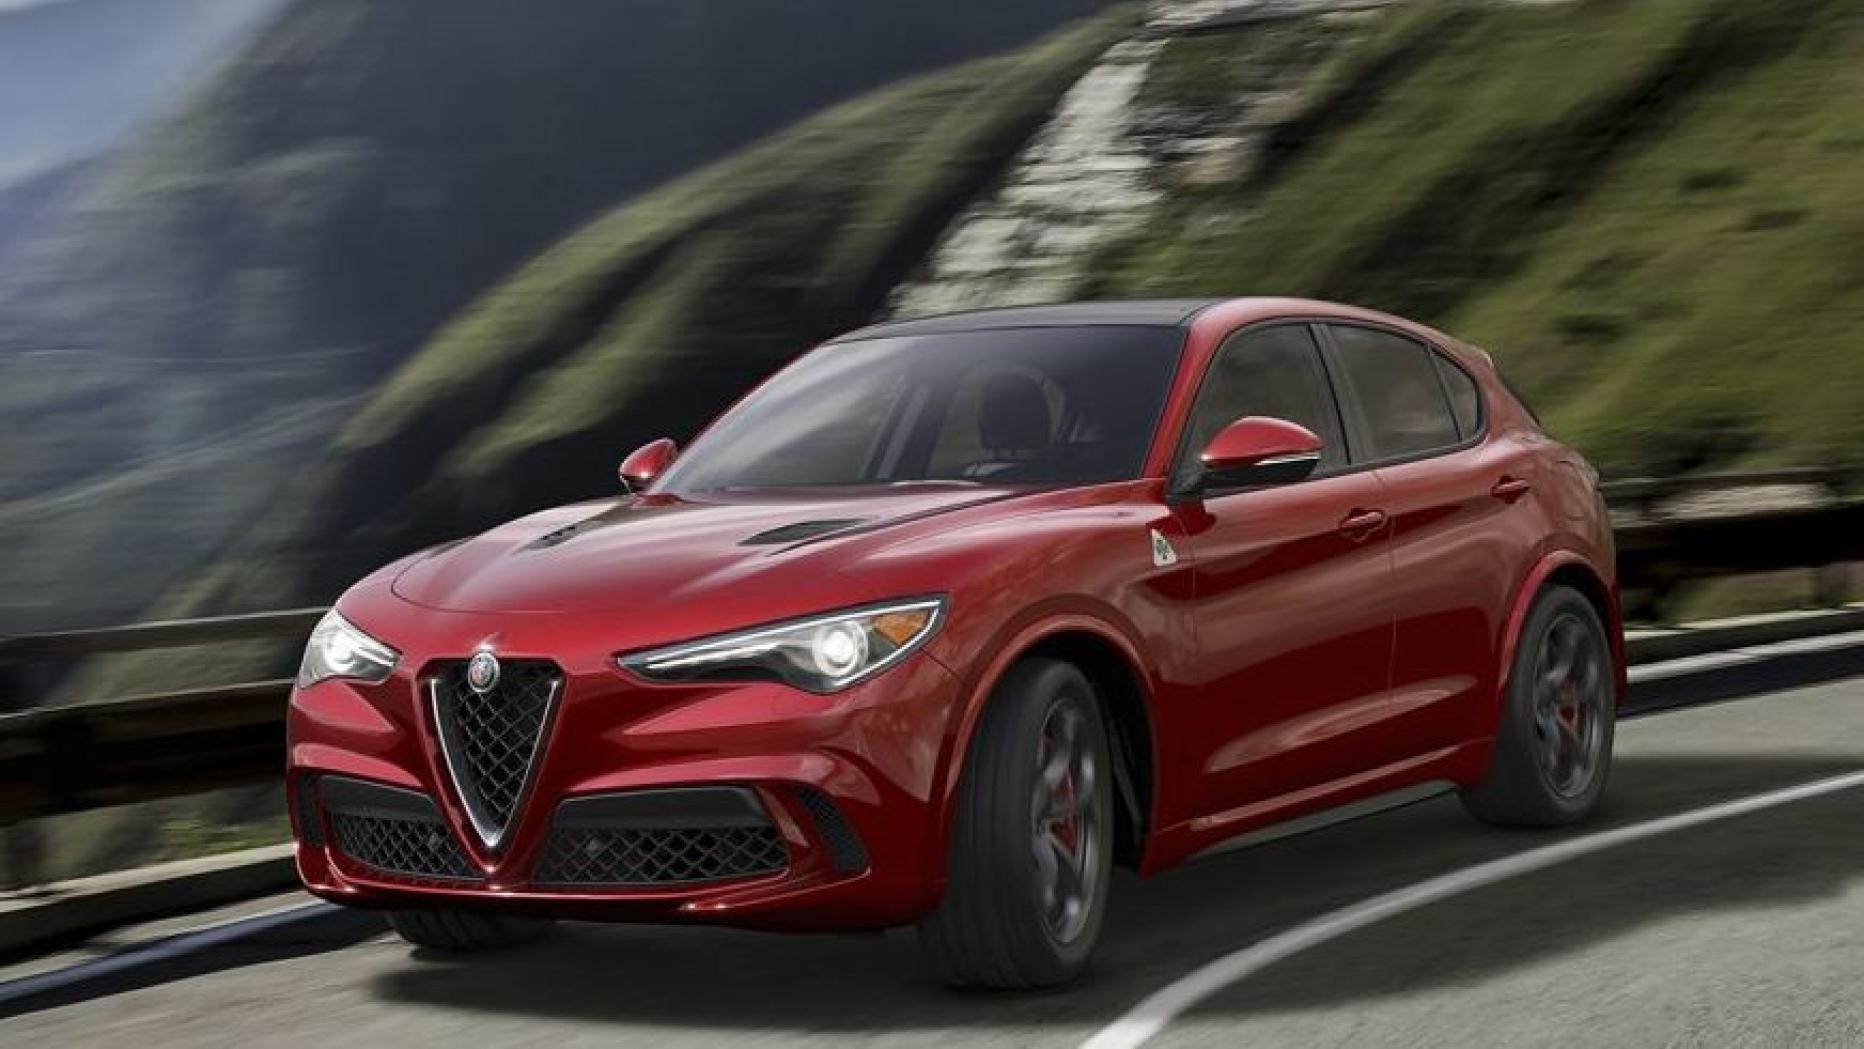 Alfa Romeo Stelvio: Quasi die Giulia fürs Grobe | motor.at